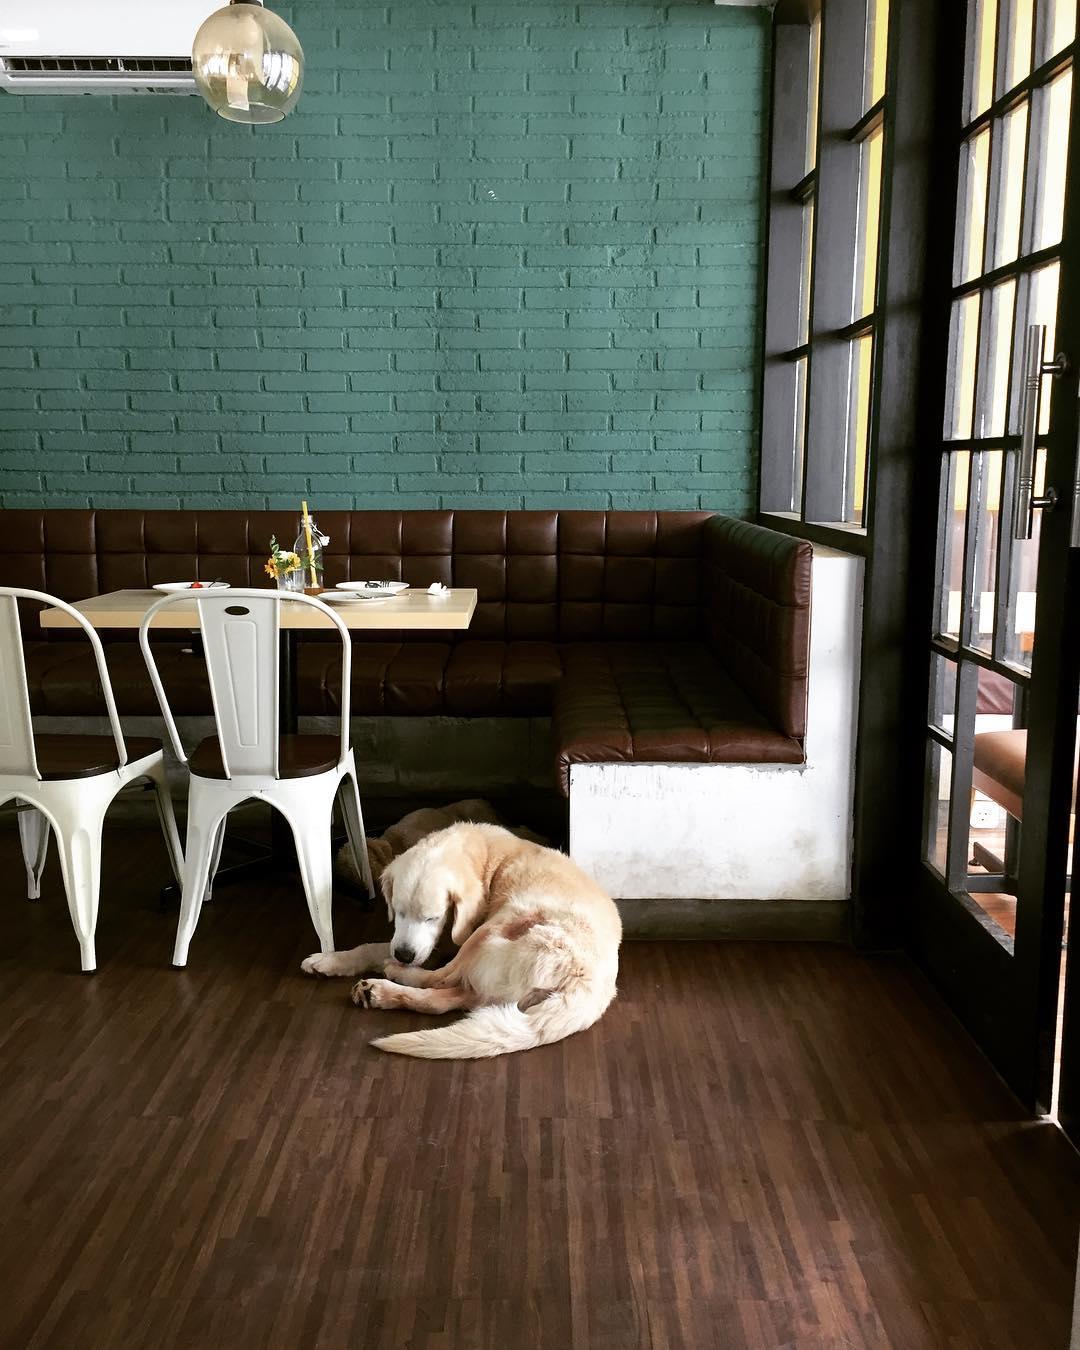 Pawvillion Dog Cafe, Pawvillion Dog Cafe Malang, Kota Malang, Malang Raya, Dolan Dolen Pawvillion Dog Cafe via gheacla - Dolan Dolen